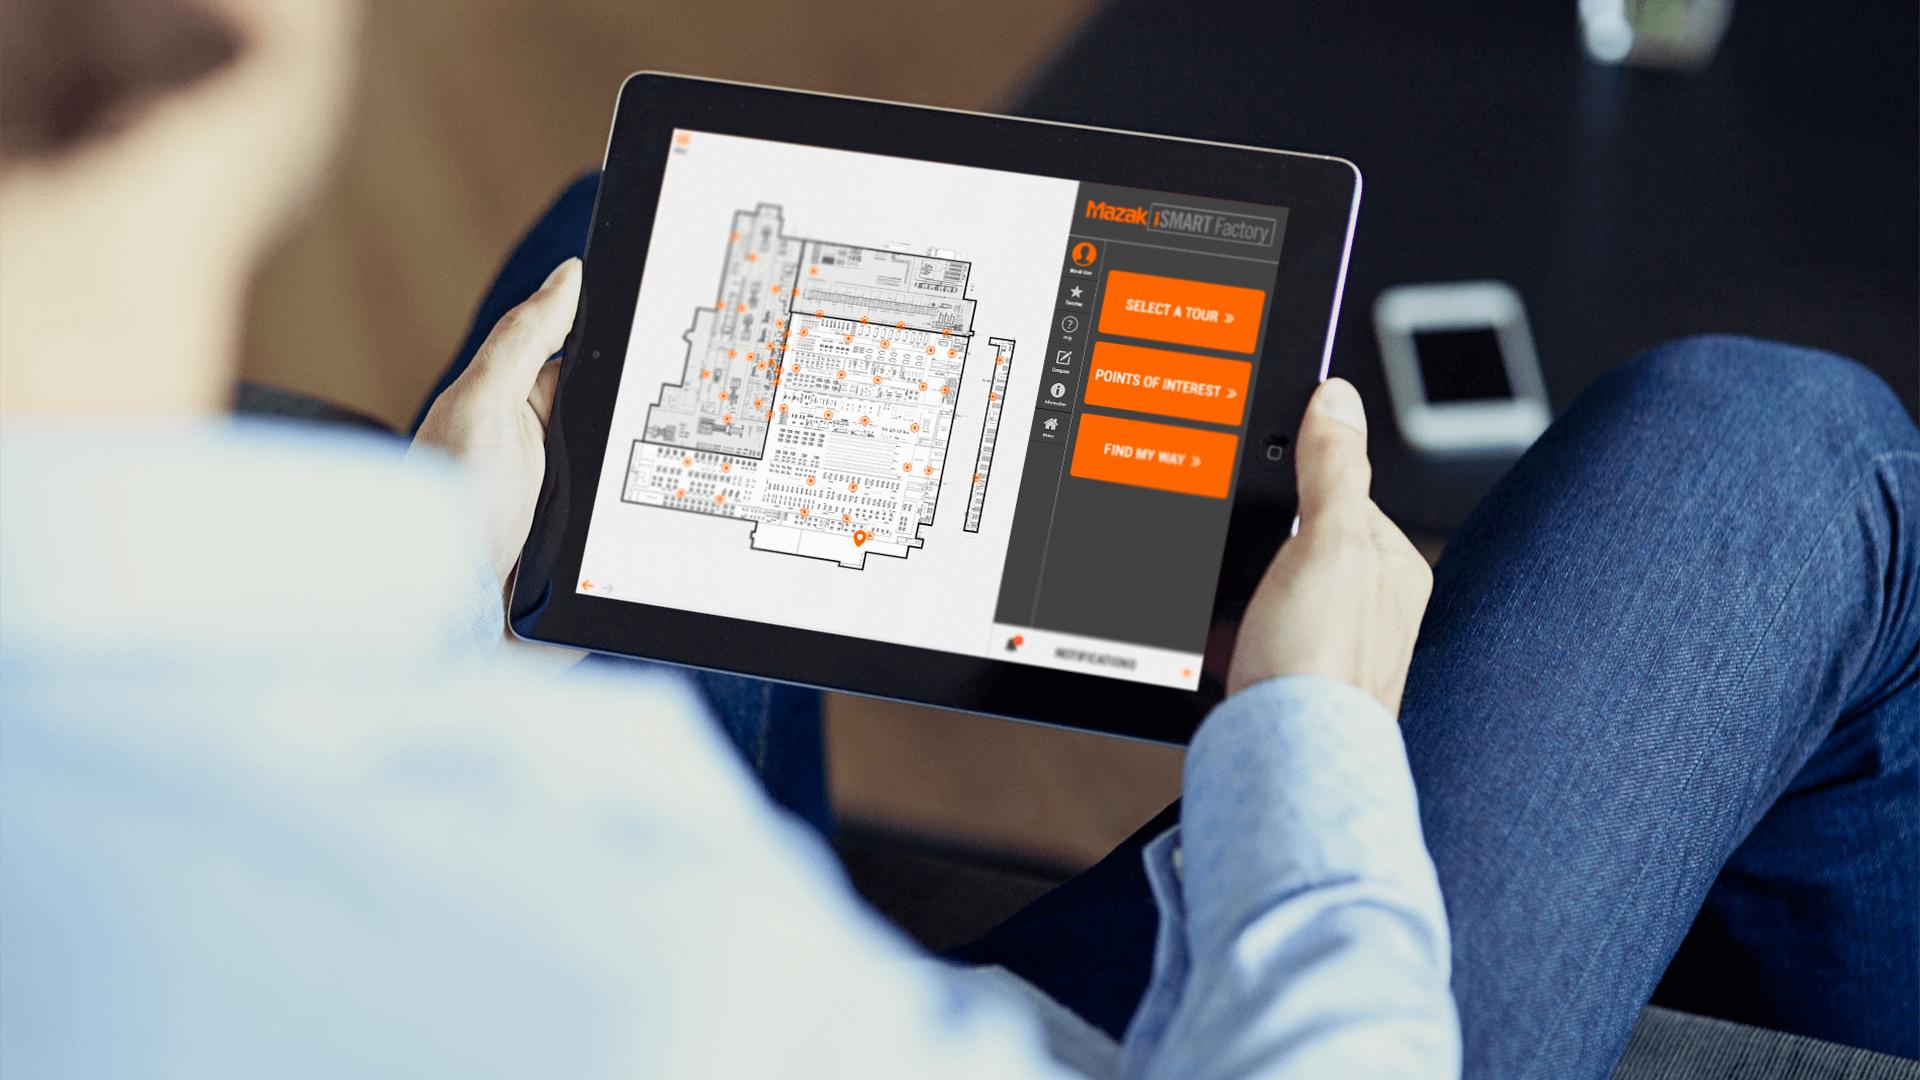 mazak-ismart-factory-app-ipad-mockup